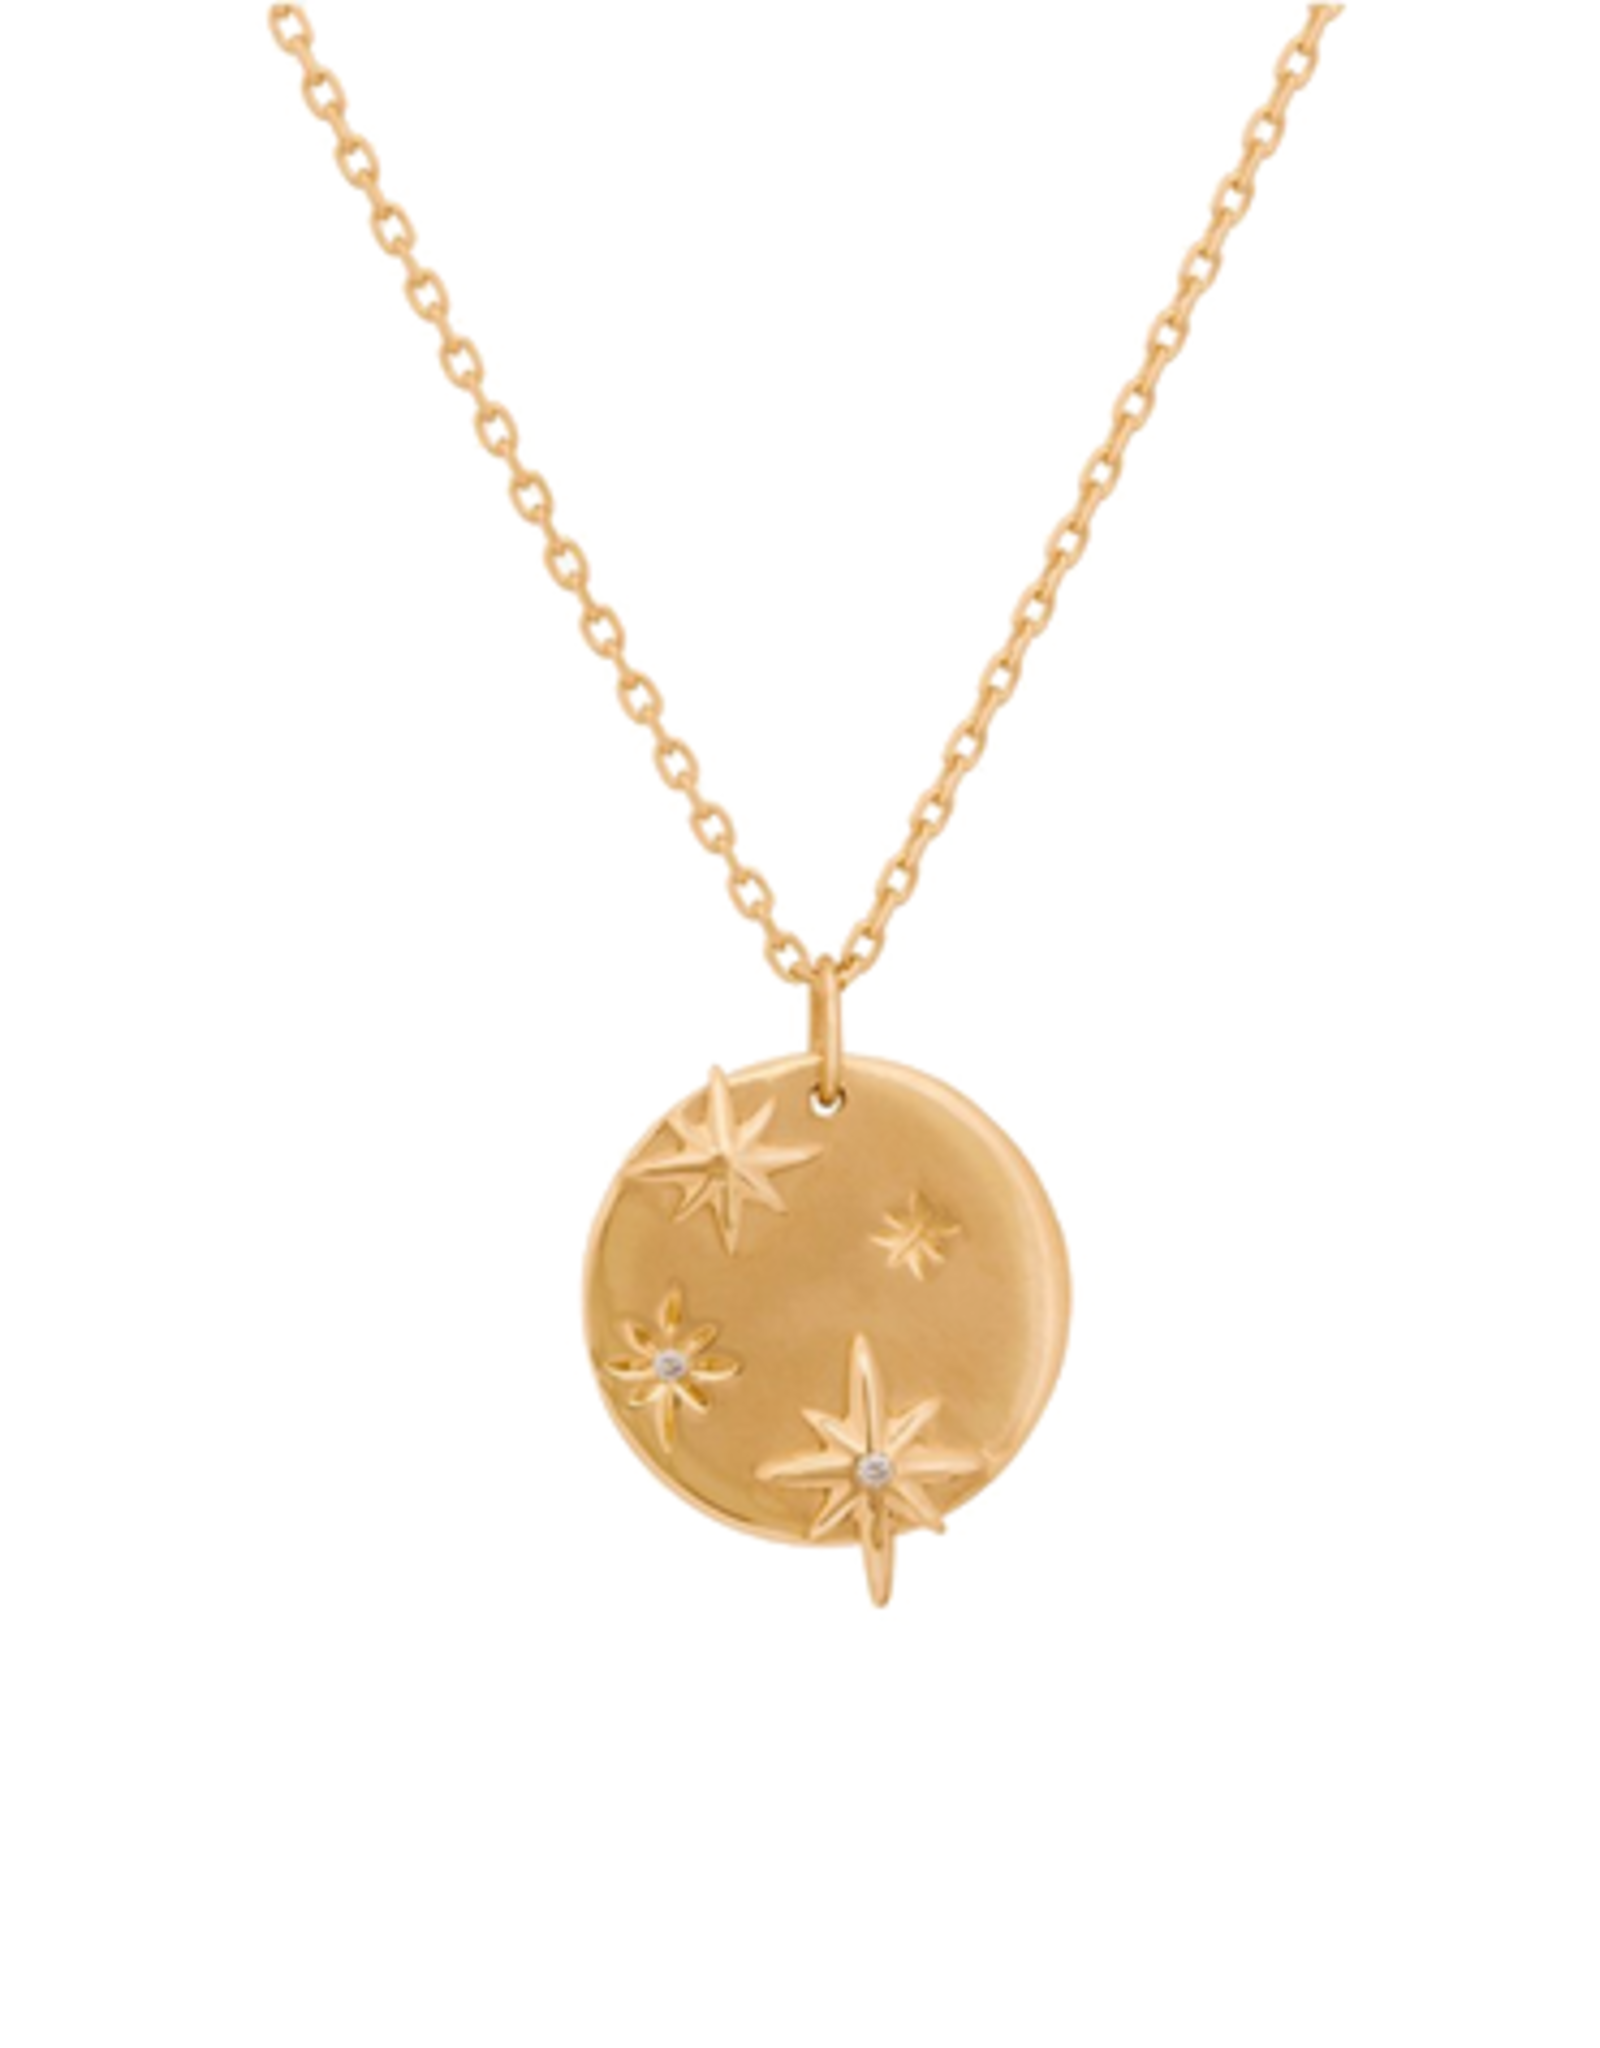 Celine Daoust Stars Medallion Necklace - Diamonds